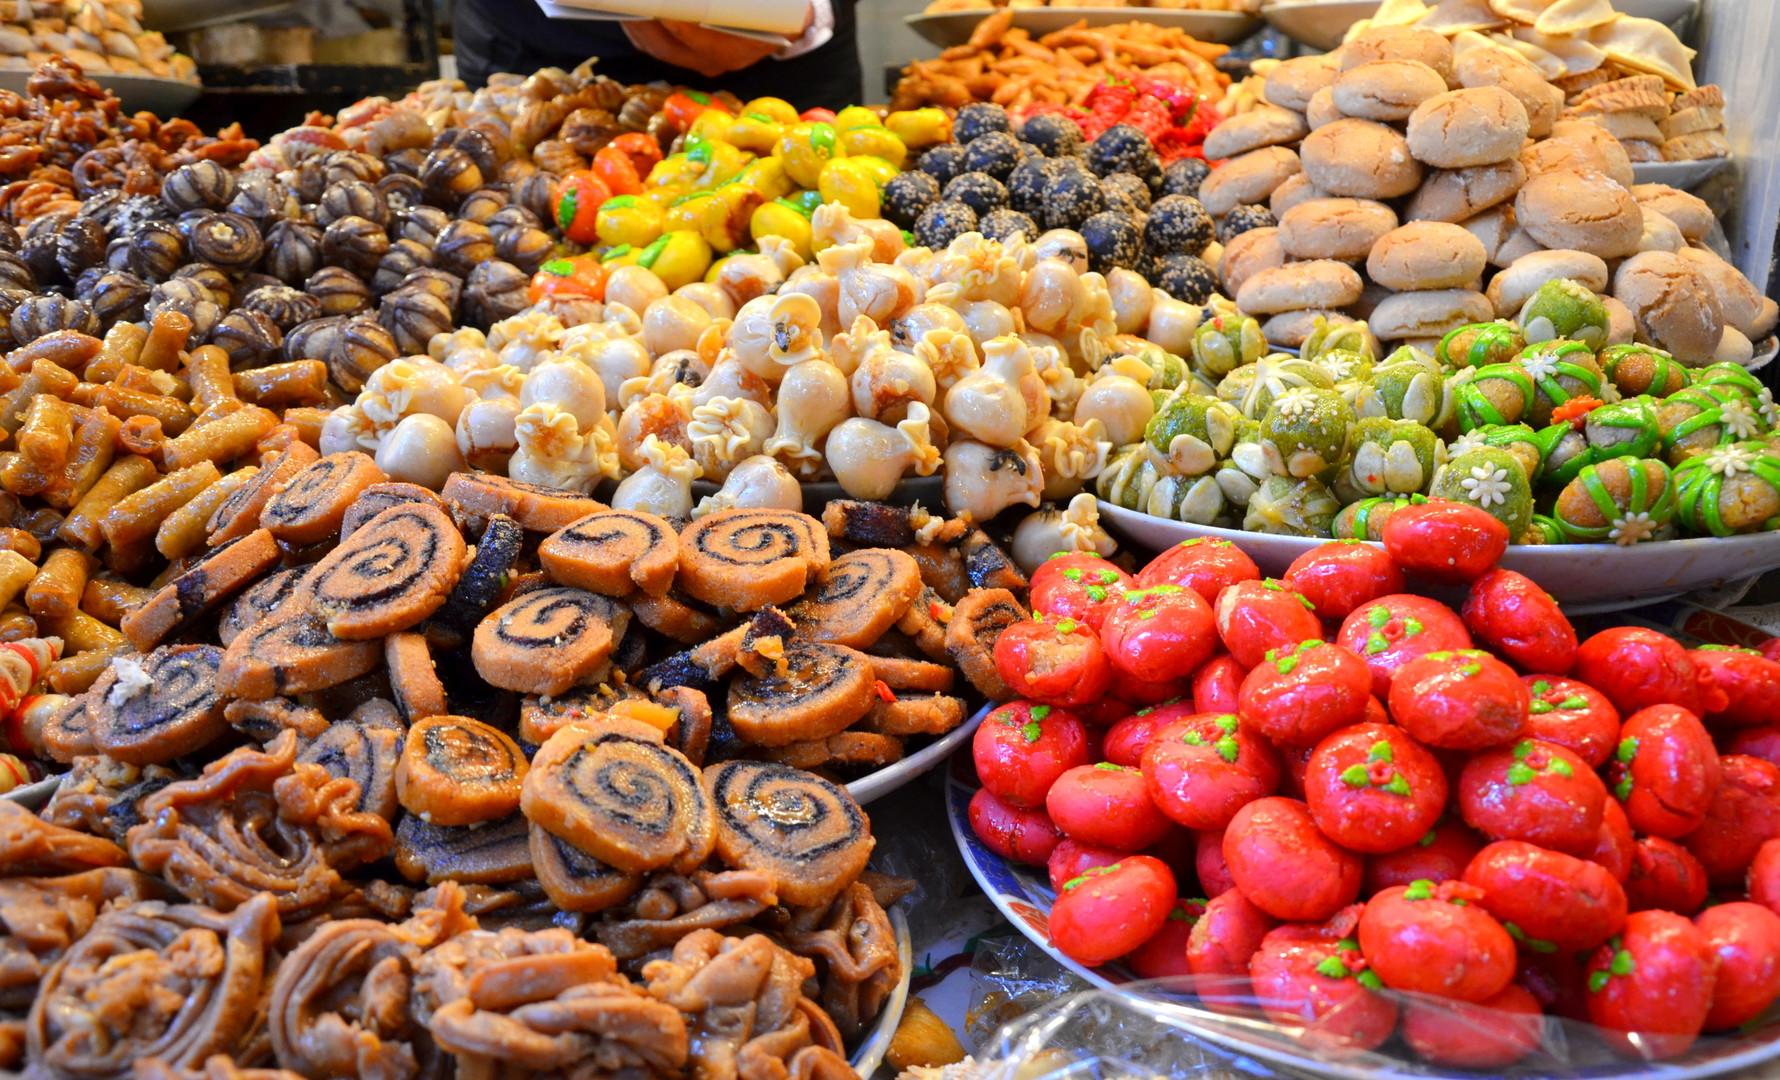 Bij L1 Moslims In Limburg Vierden Suikerfeest L1